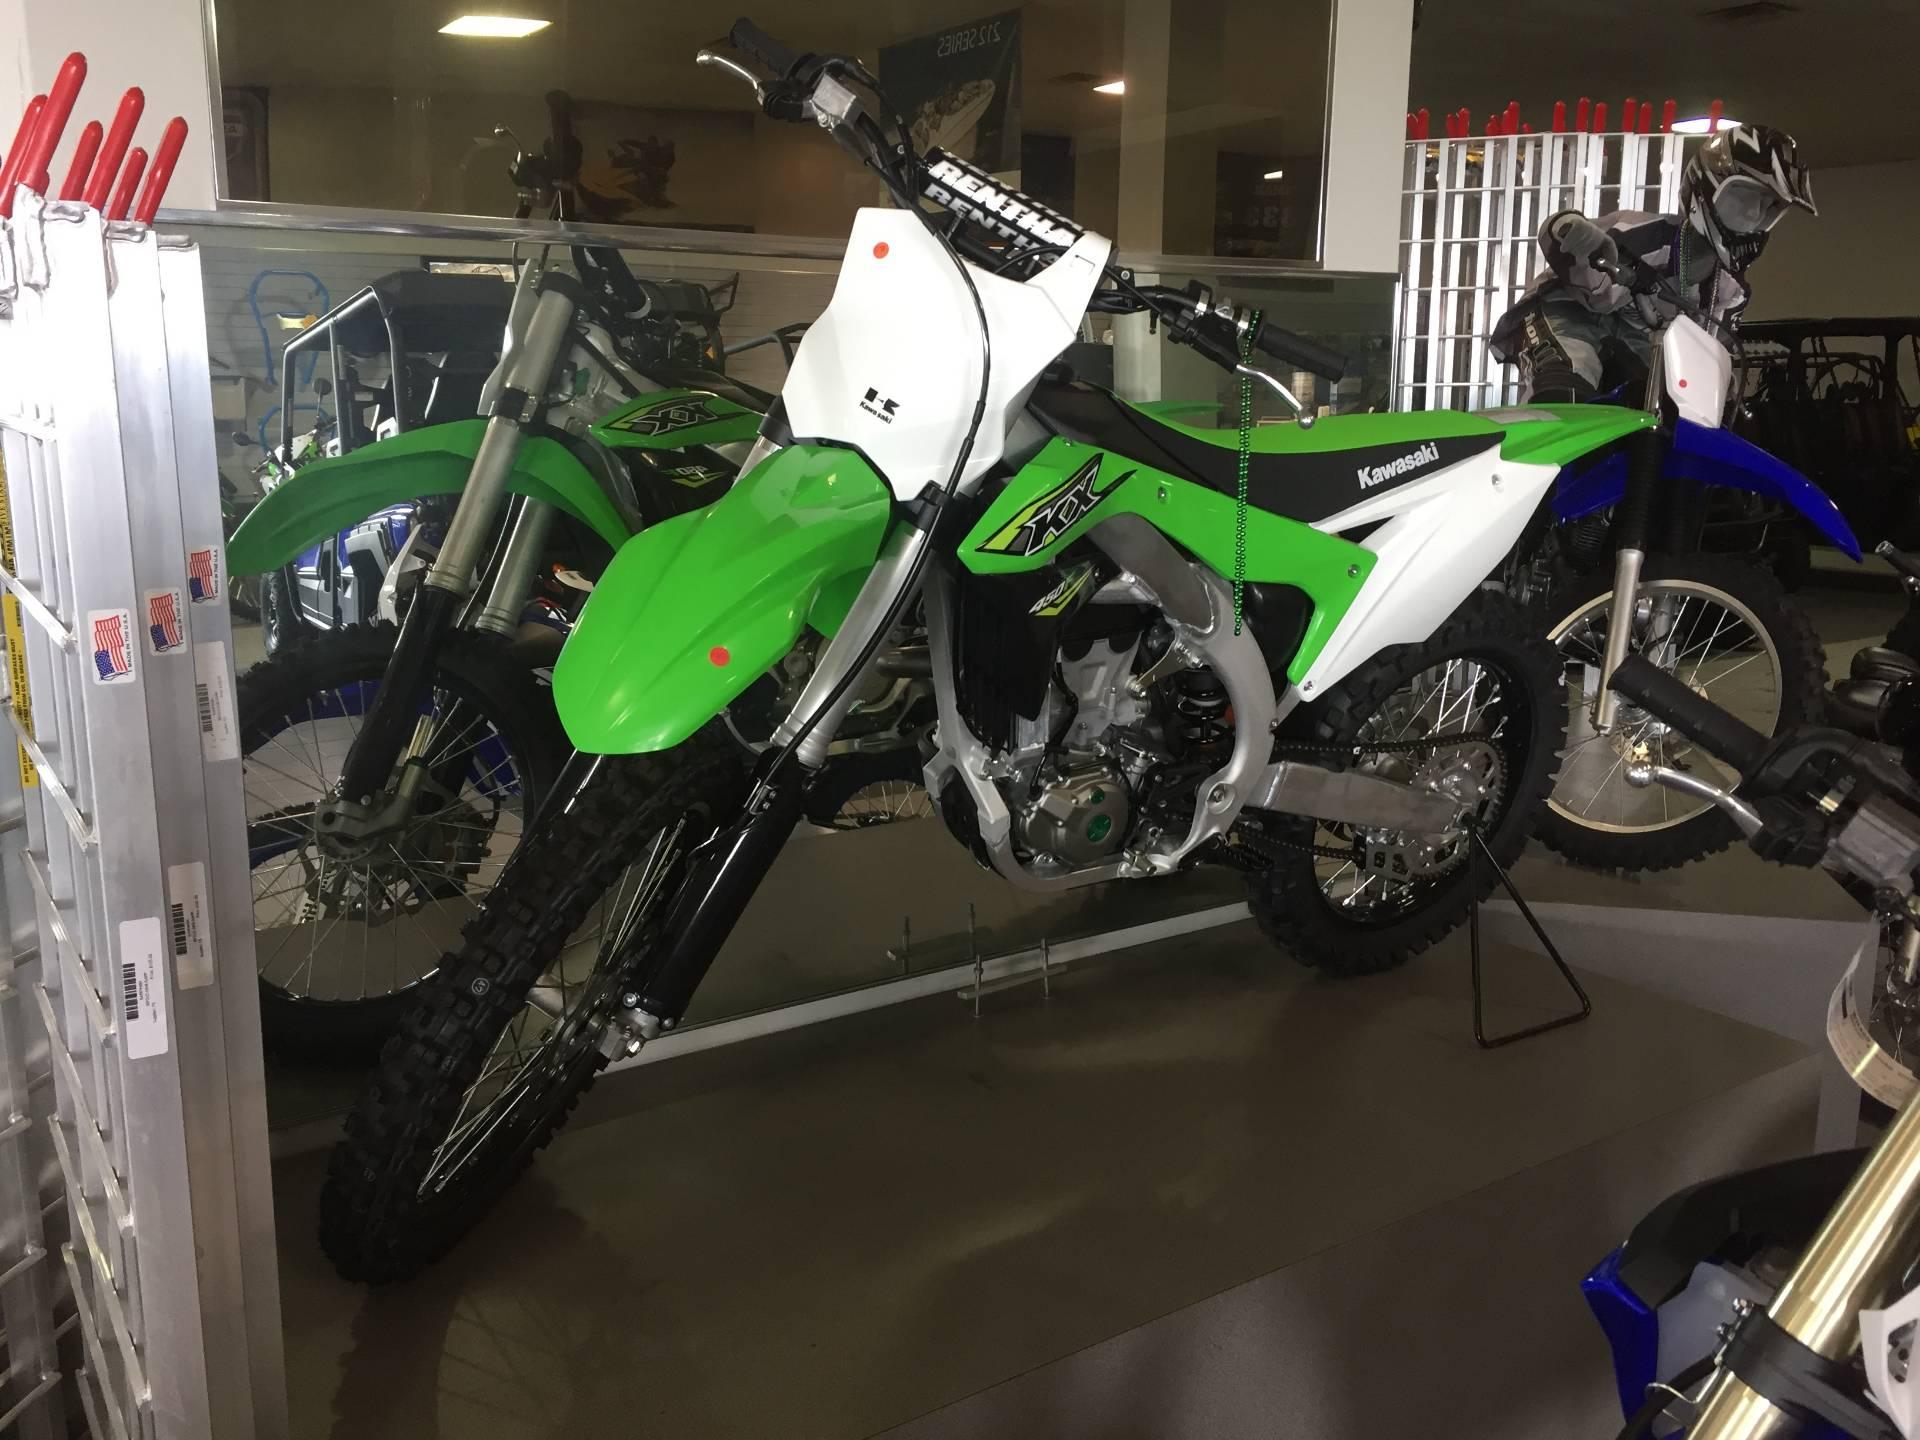 New 2018 Kawasaki KX 450F Motorcycles in Lafayette, LA